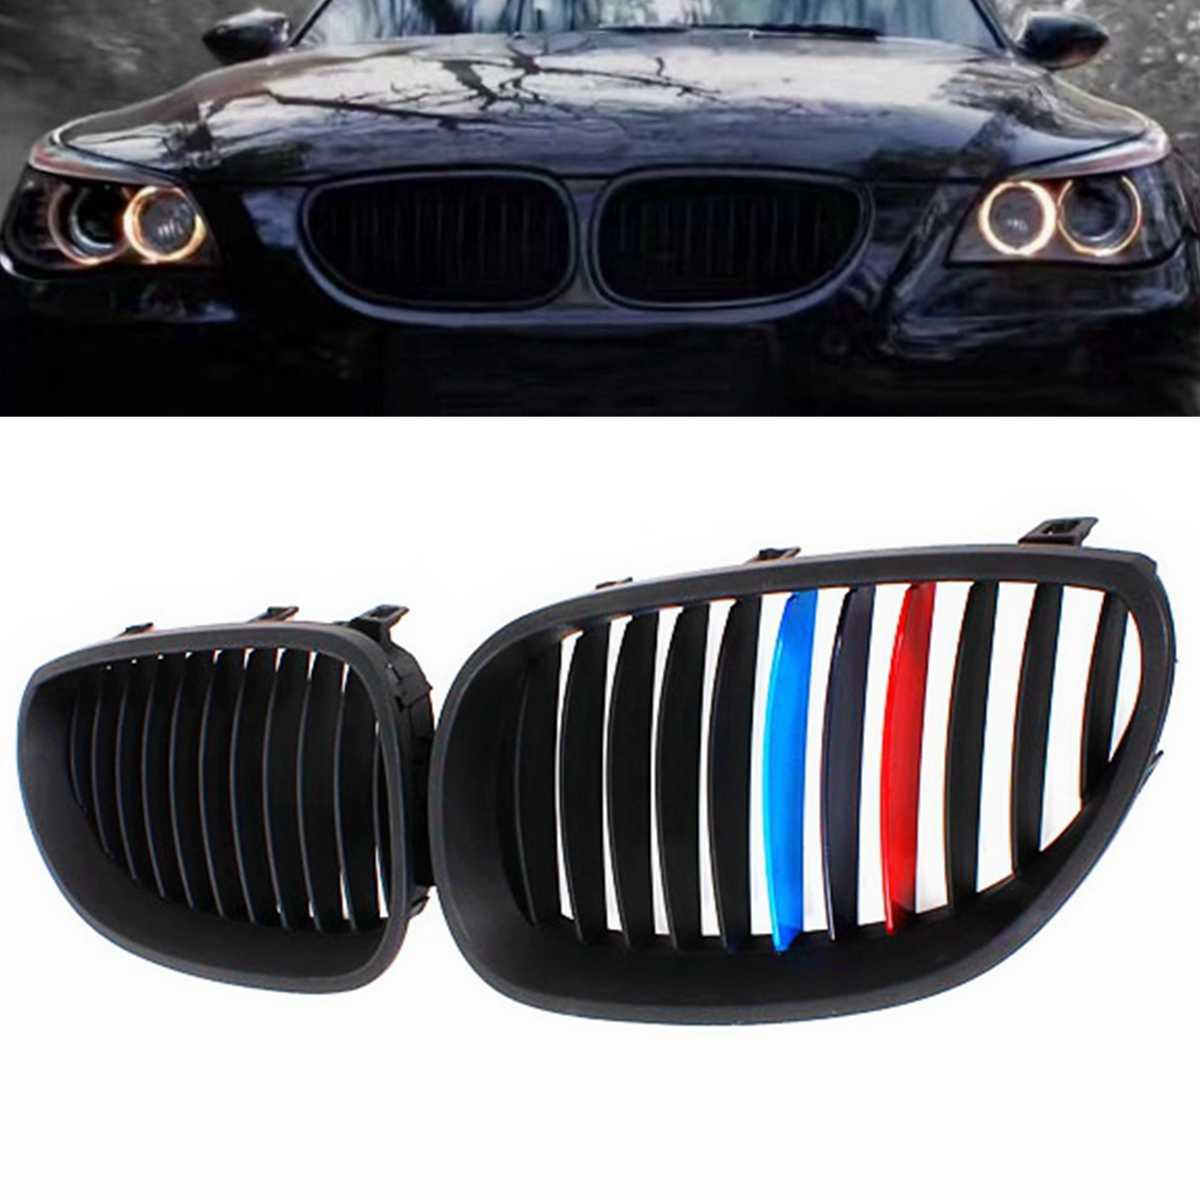 Pasangan Gloss/Matte Hitam Mobil Depan Olahraga Grill Ginjal Kisi-kisi Panggangan untuk BMW 5 Series M5 E60/E61 2003 2004 2005 2006 2007 2008 2009